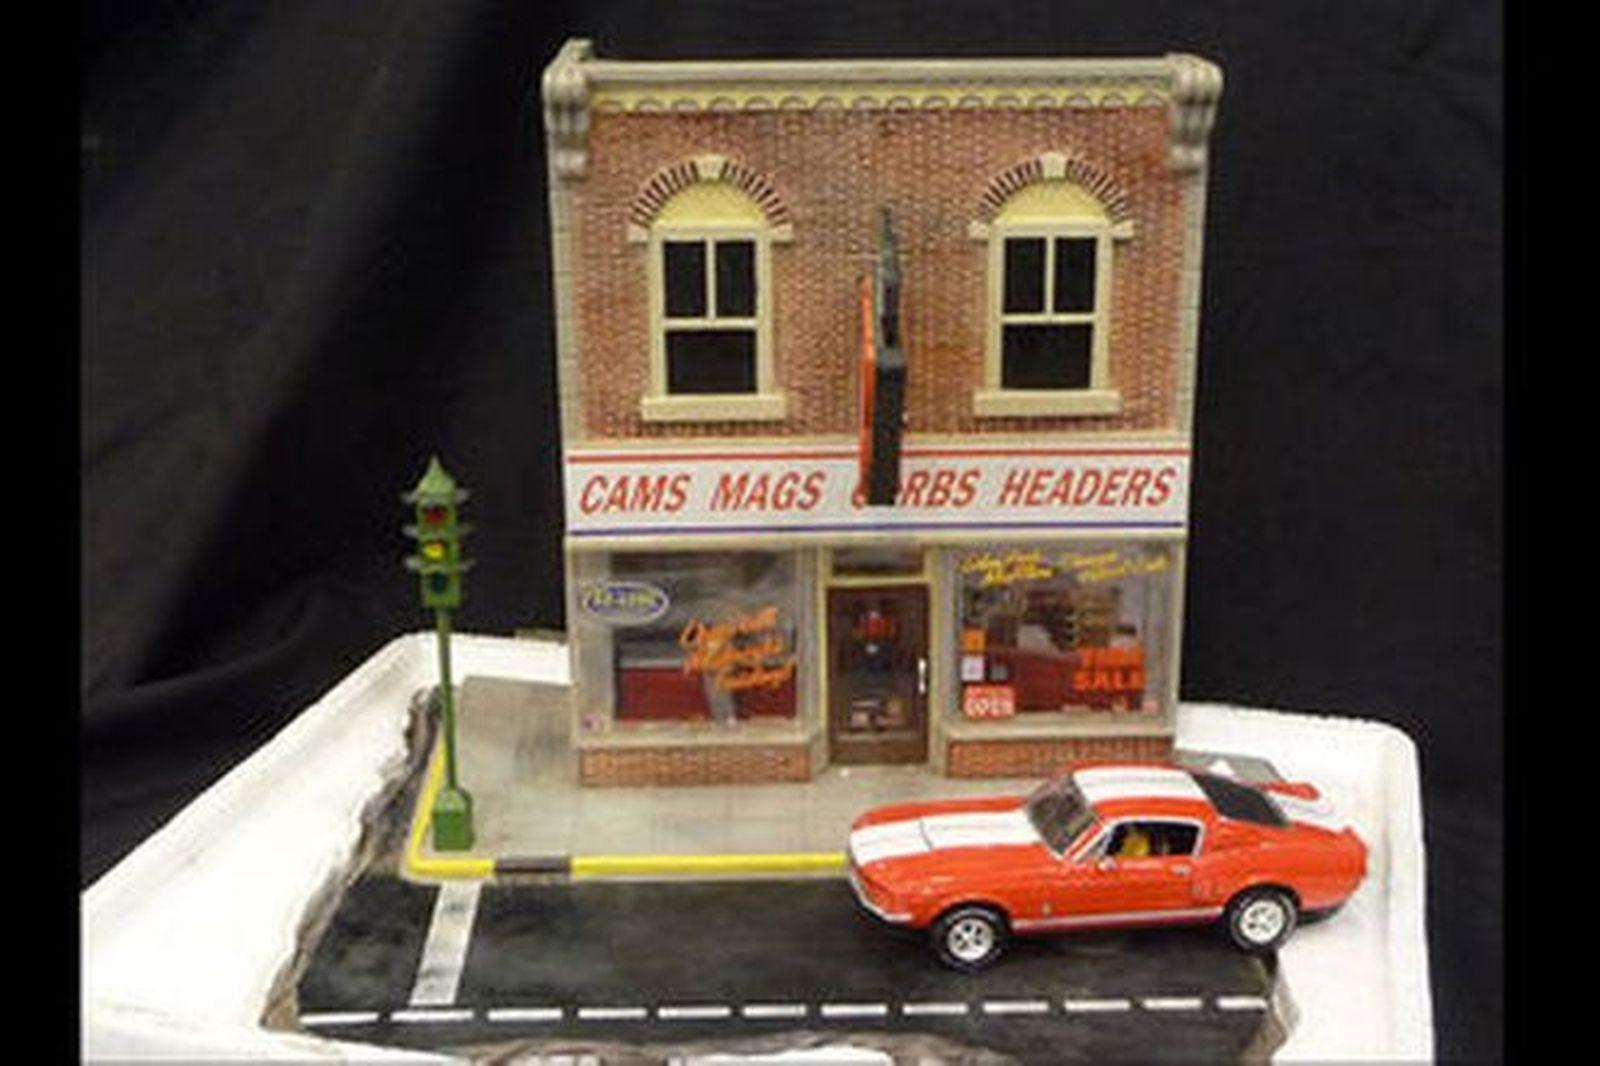 Models x 2 - Model of Service Station (70cm x 40cm) and Speed Shop (24cm x 20cm)